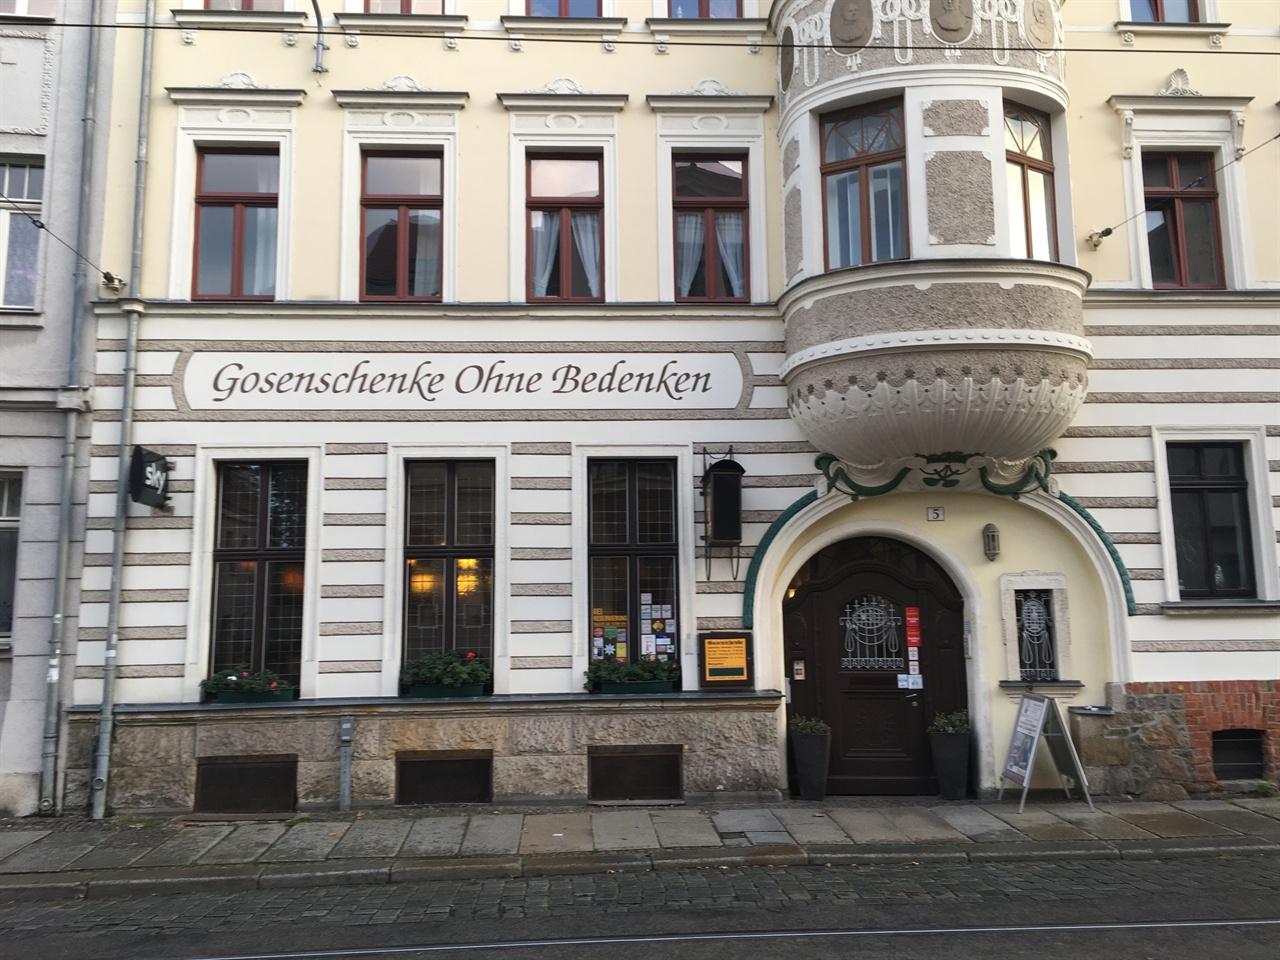 Ohne Bedenken Gosenschenke 1985년 고제는 이곳에서 다시 부활했다